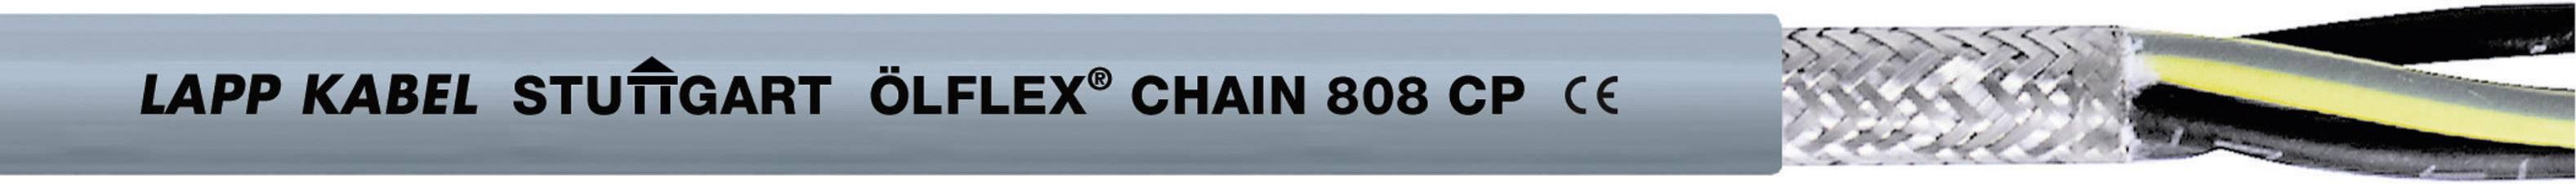 Žíla kabelu LappKabel ÖLFLEX CHAIN 808 CP 7G1,0 (1027771), 7x 1 mm², polyurethan, Ø 9,8 mm, stíněný, 50 m, šed